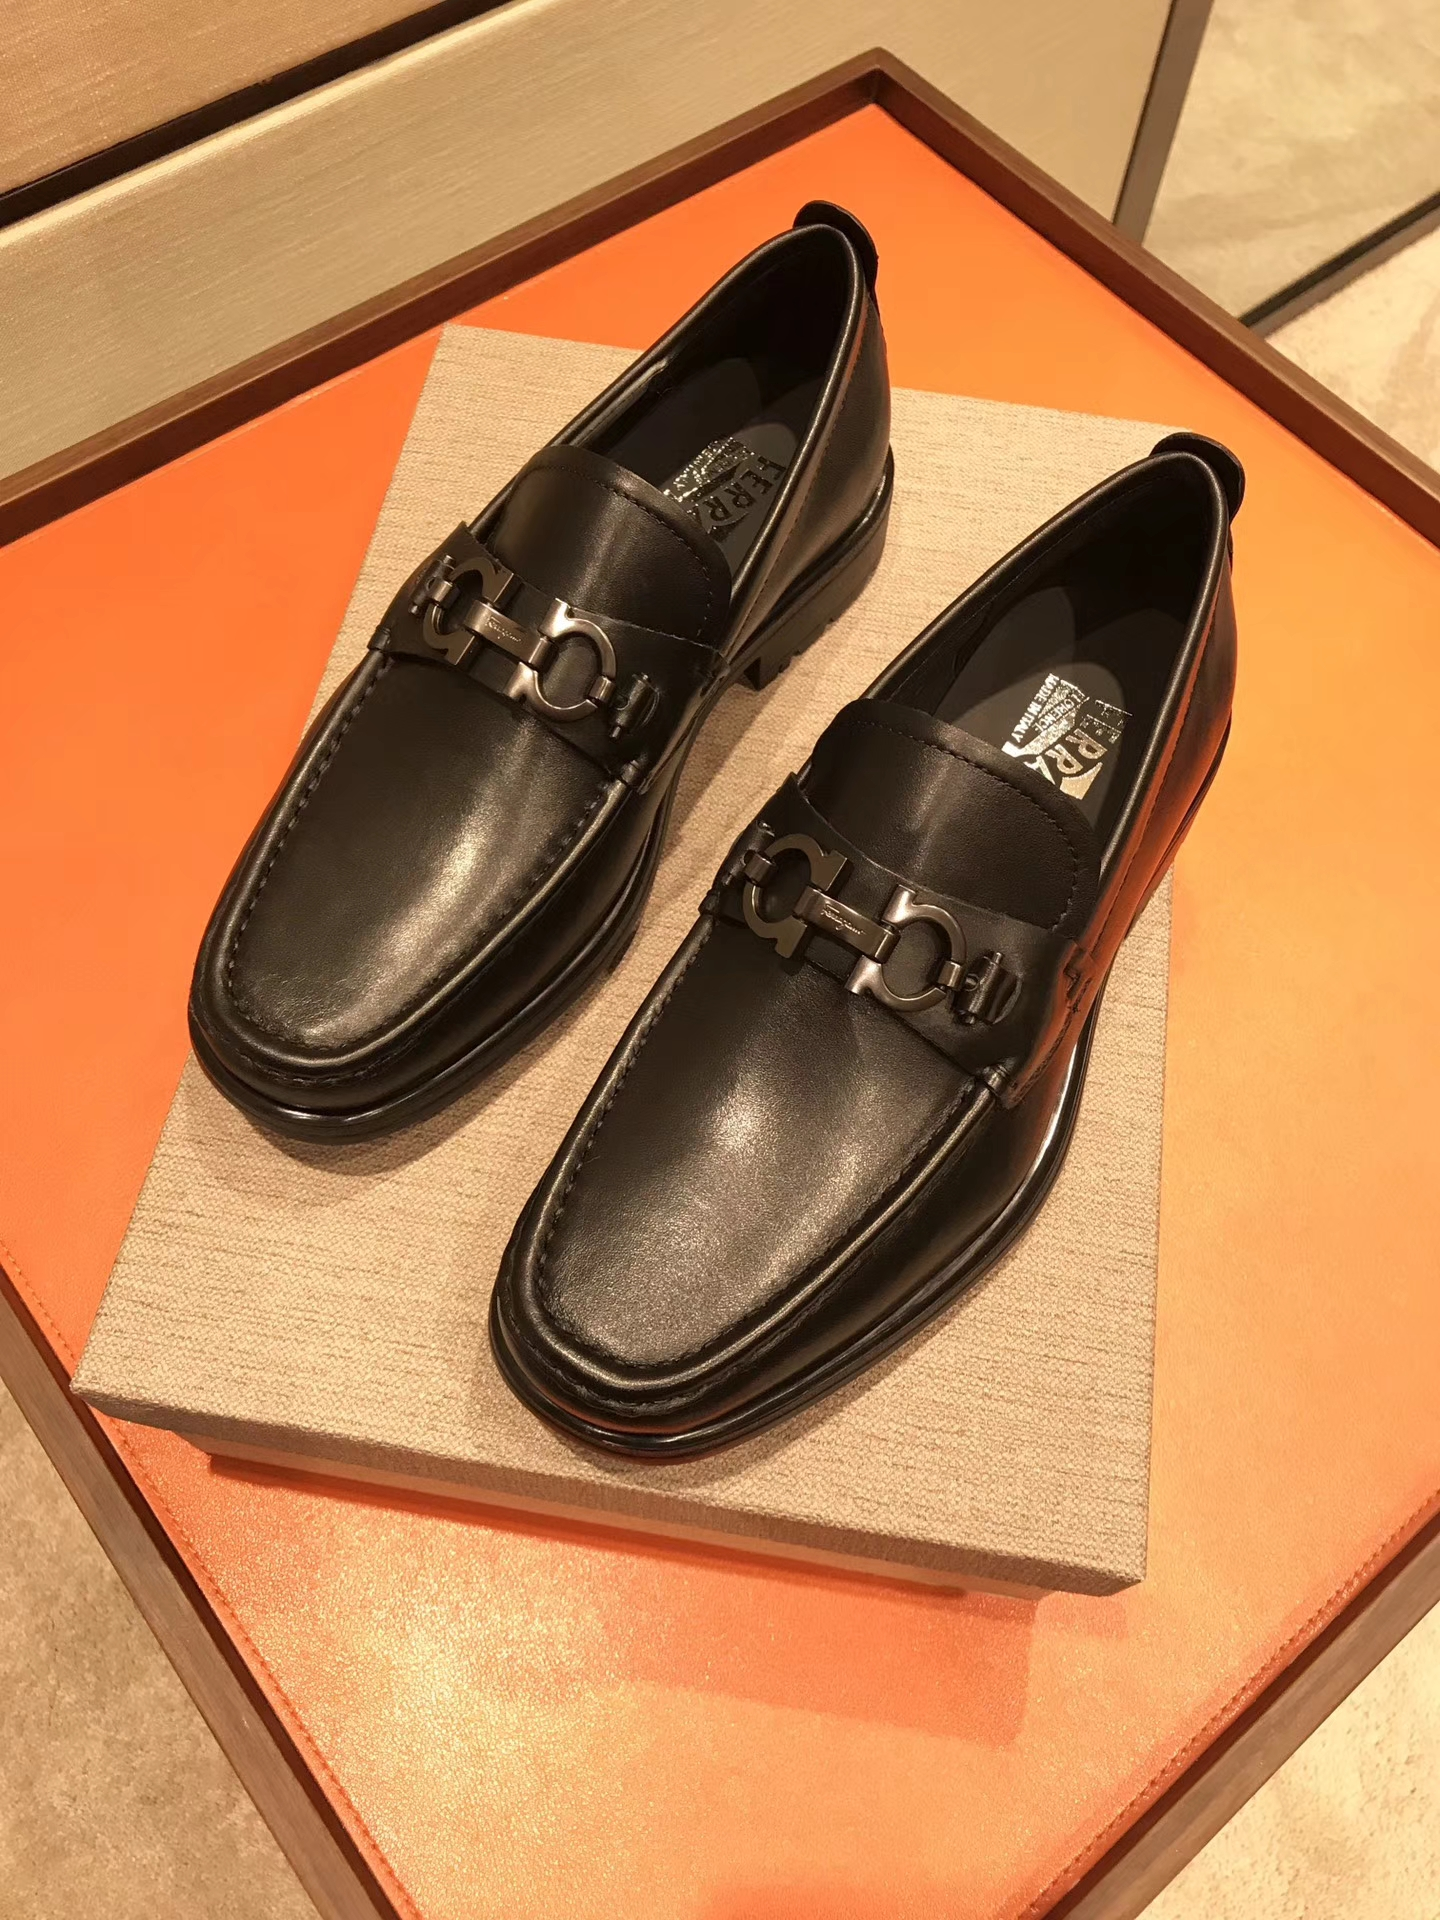 salvatore ferragamo男鞋 代购品质男士休闲鞋